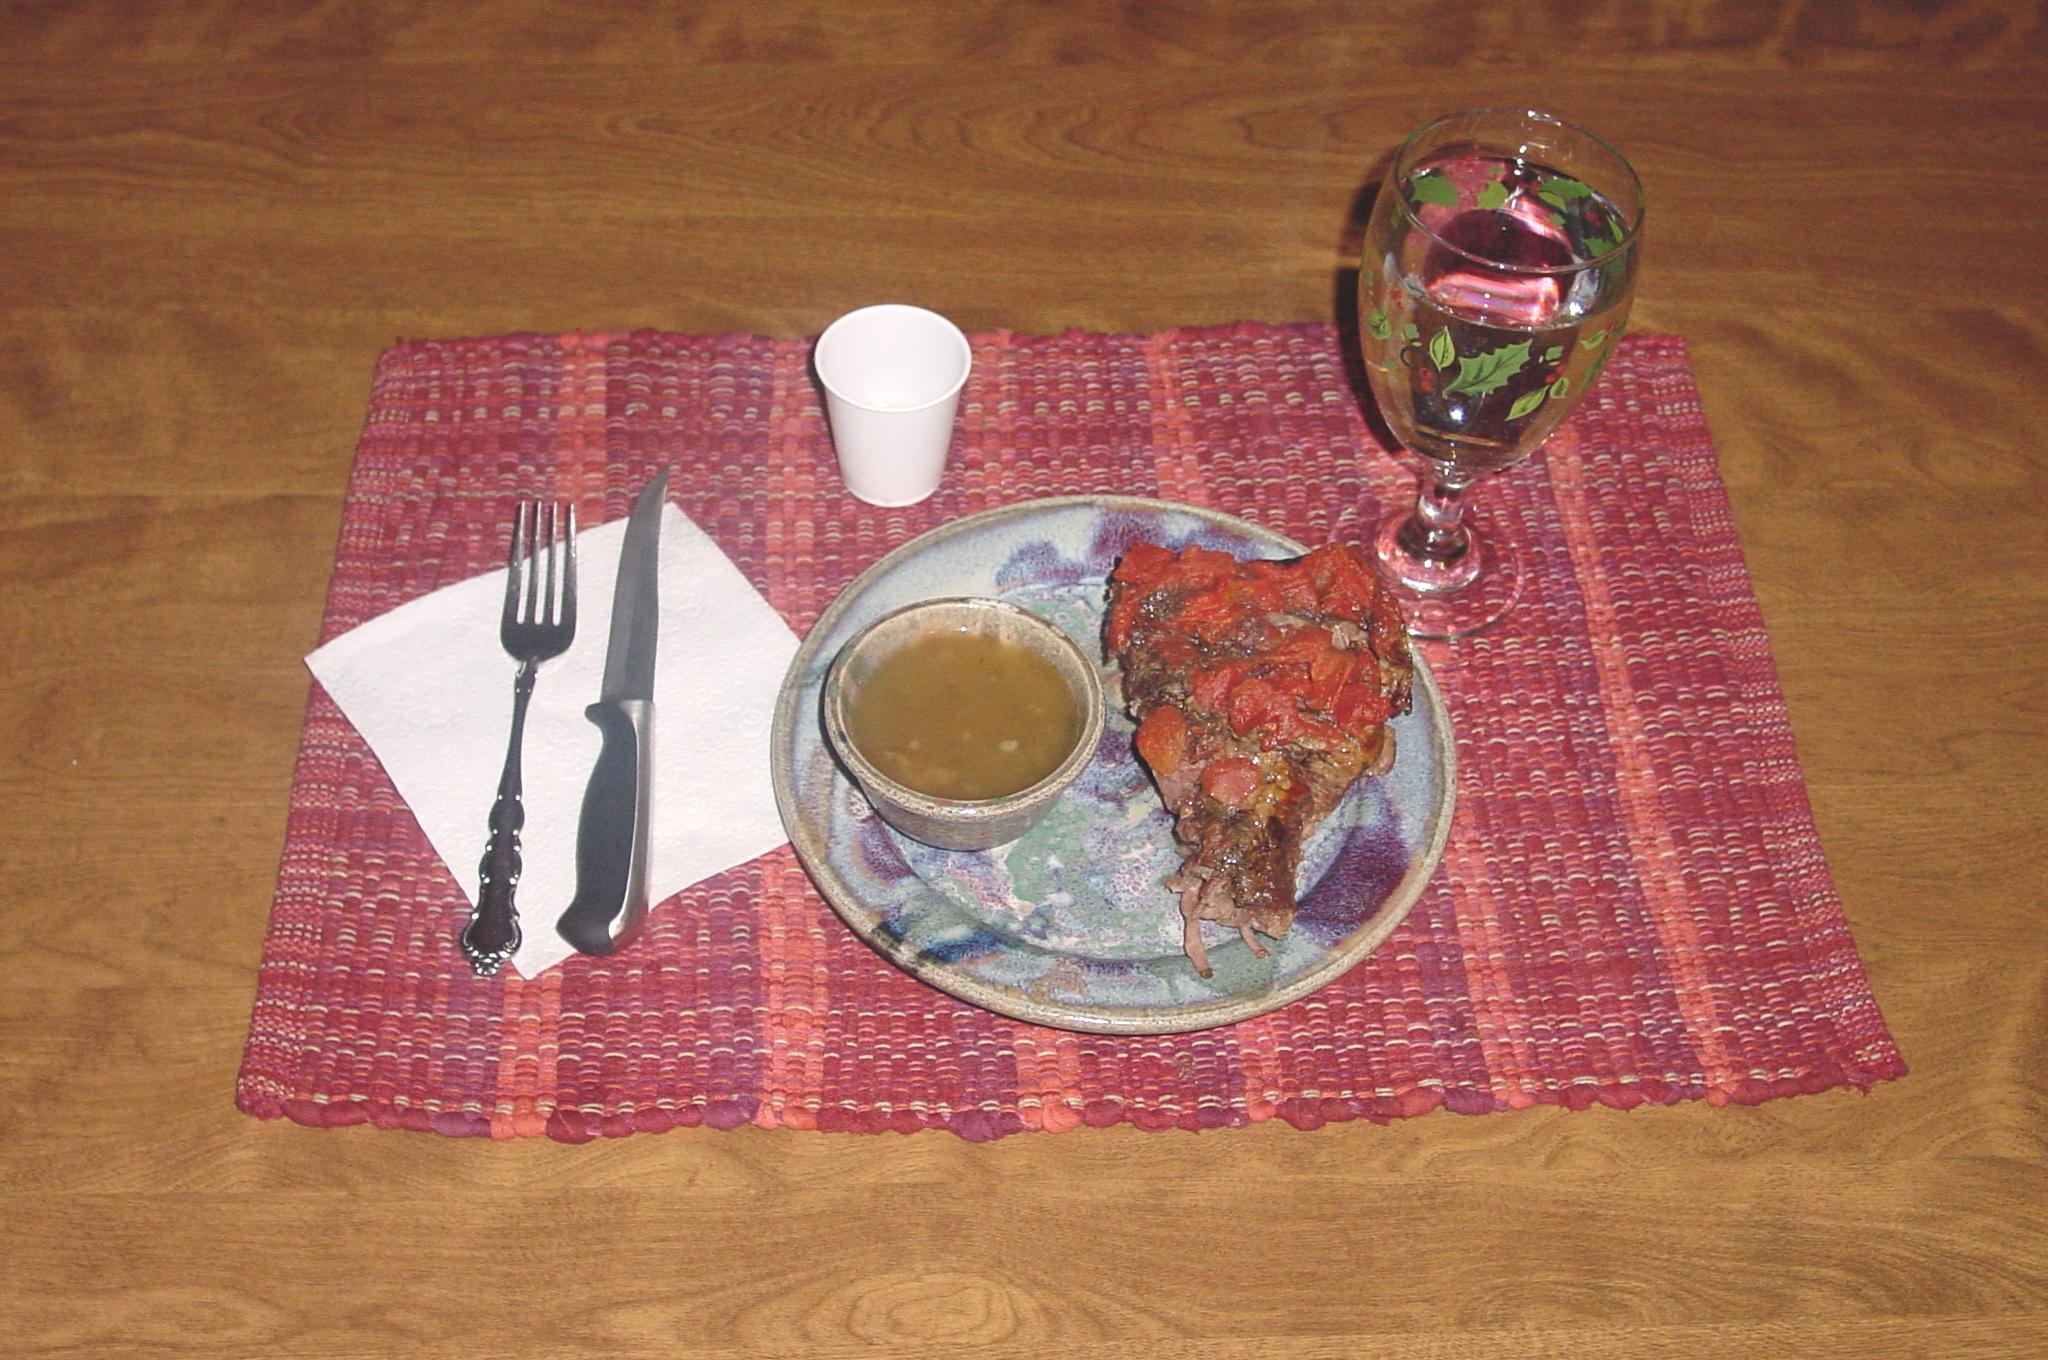 cholesterol dinner big&ampusgAFQjCNHdwfmvwbKBPaPknljN LLv0Am6 g